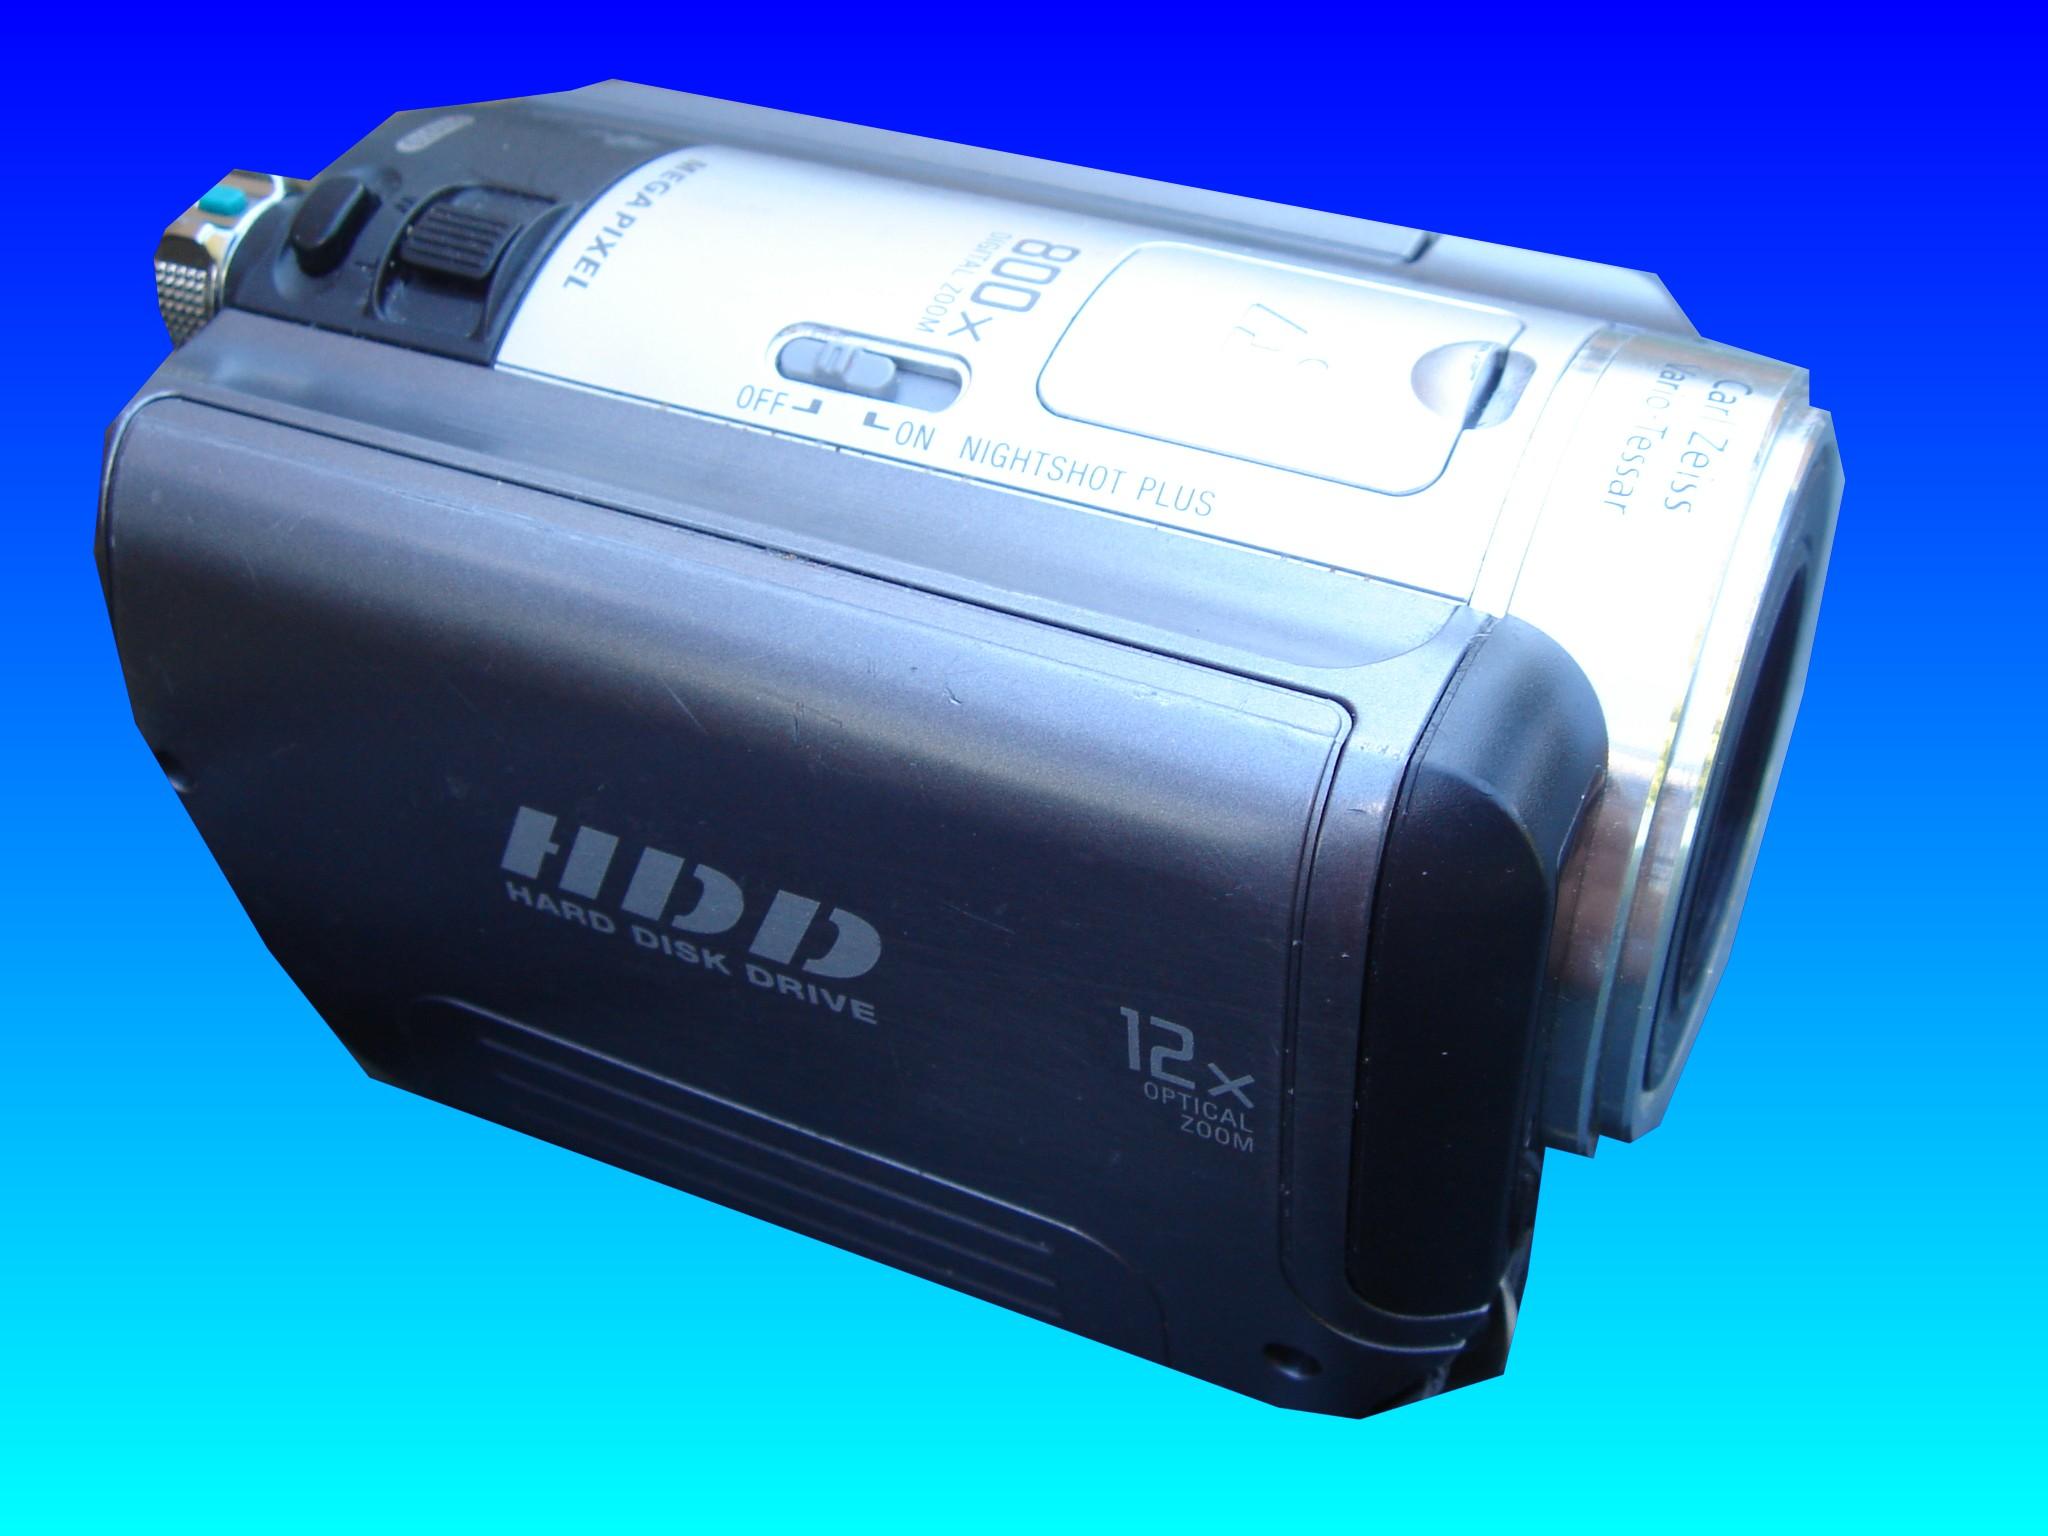 Erased videos from a Sony HDD handycam DCR-SR70.